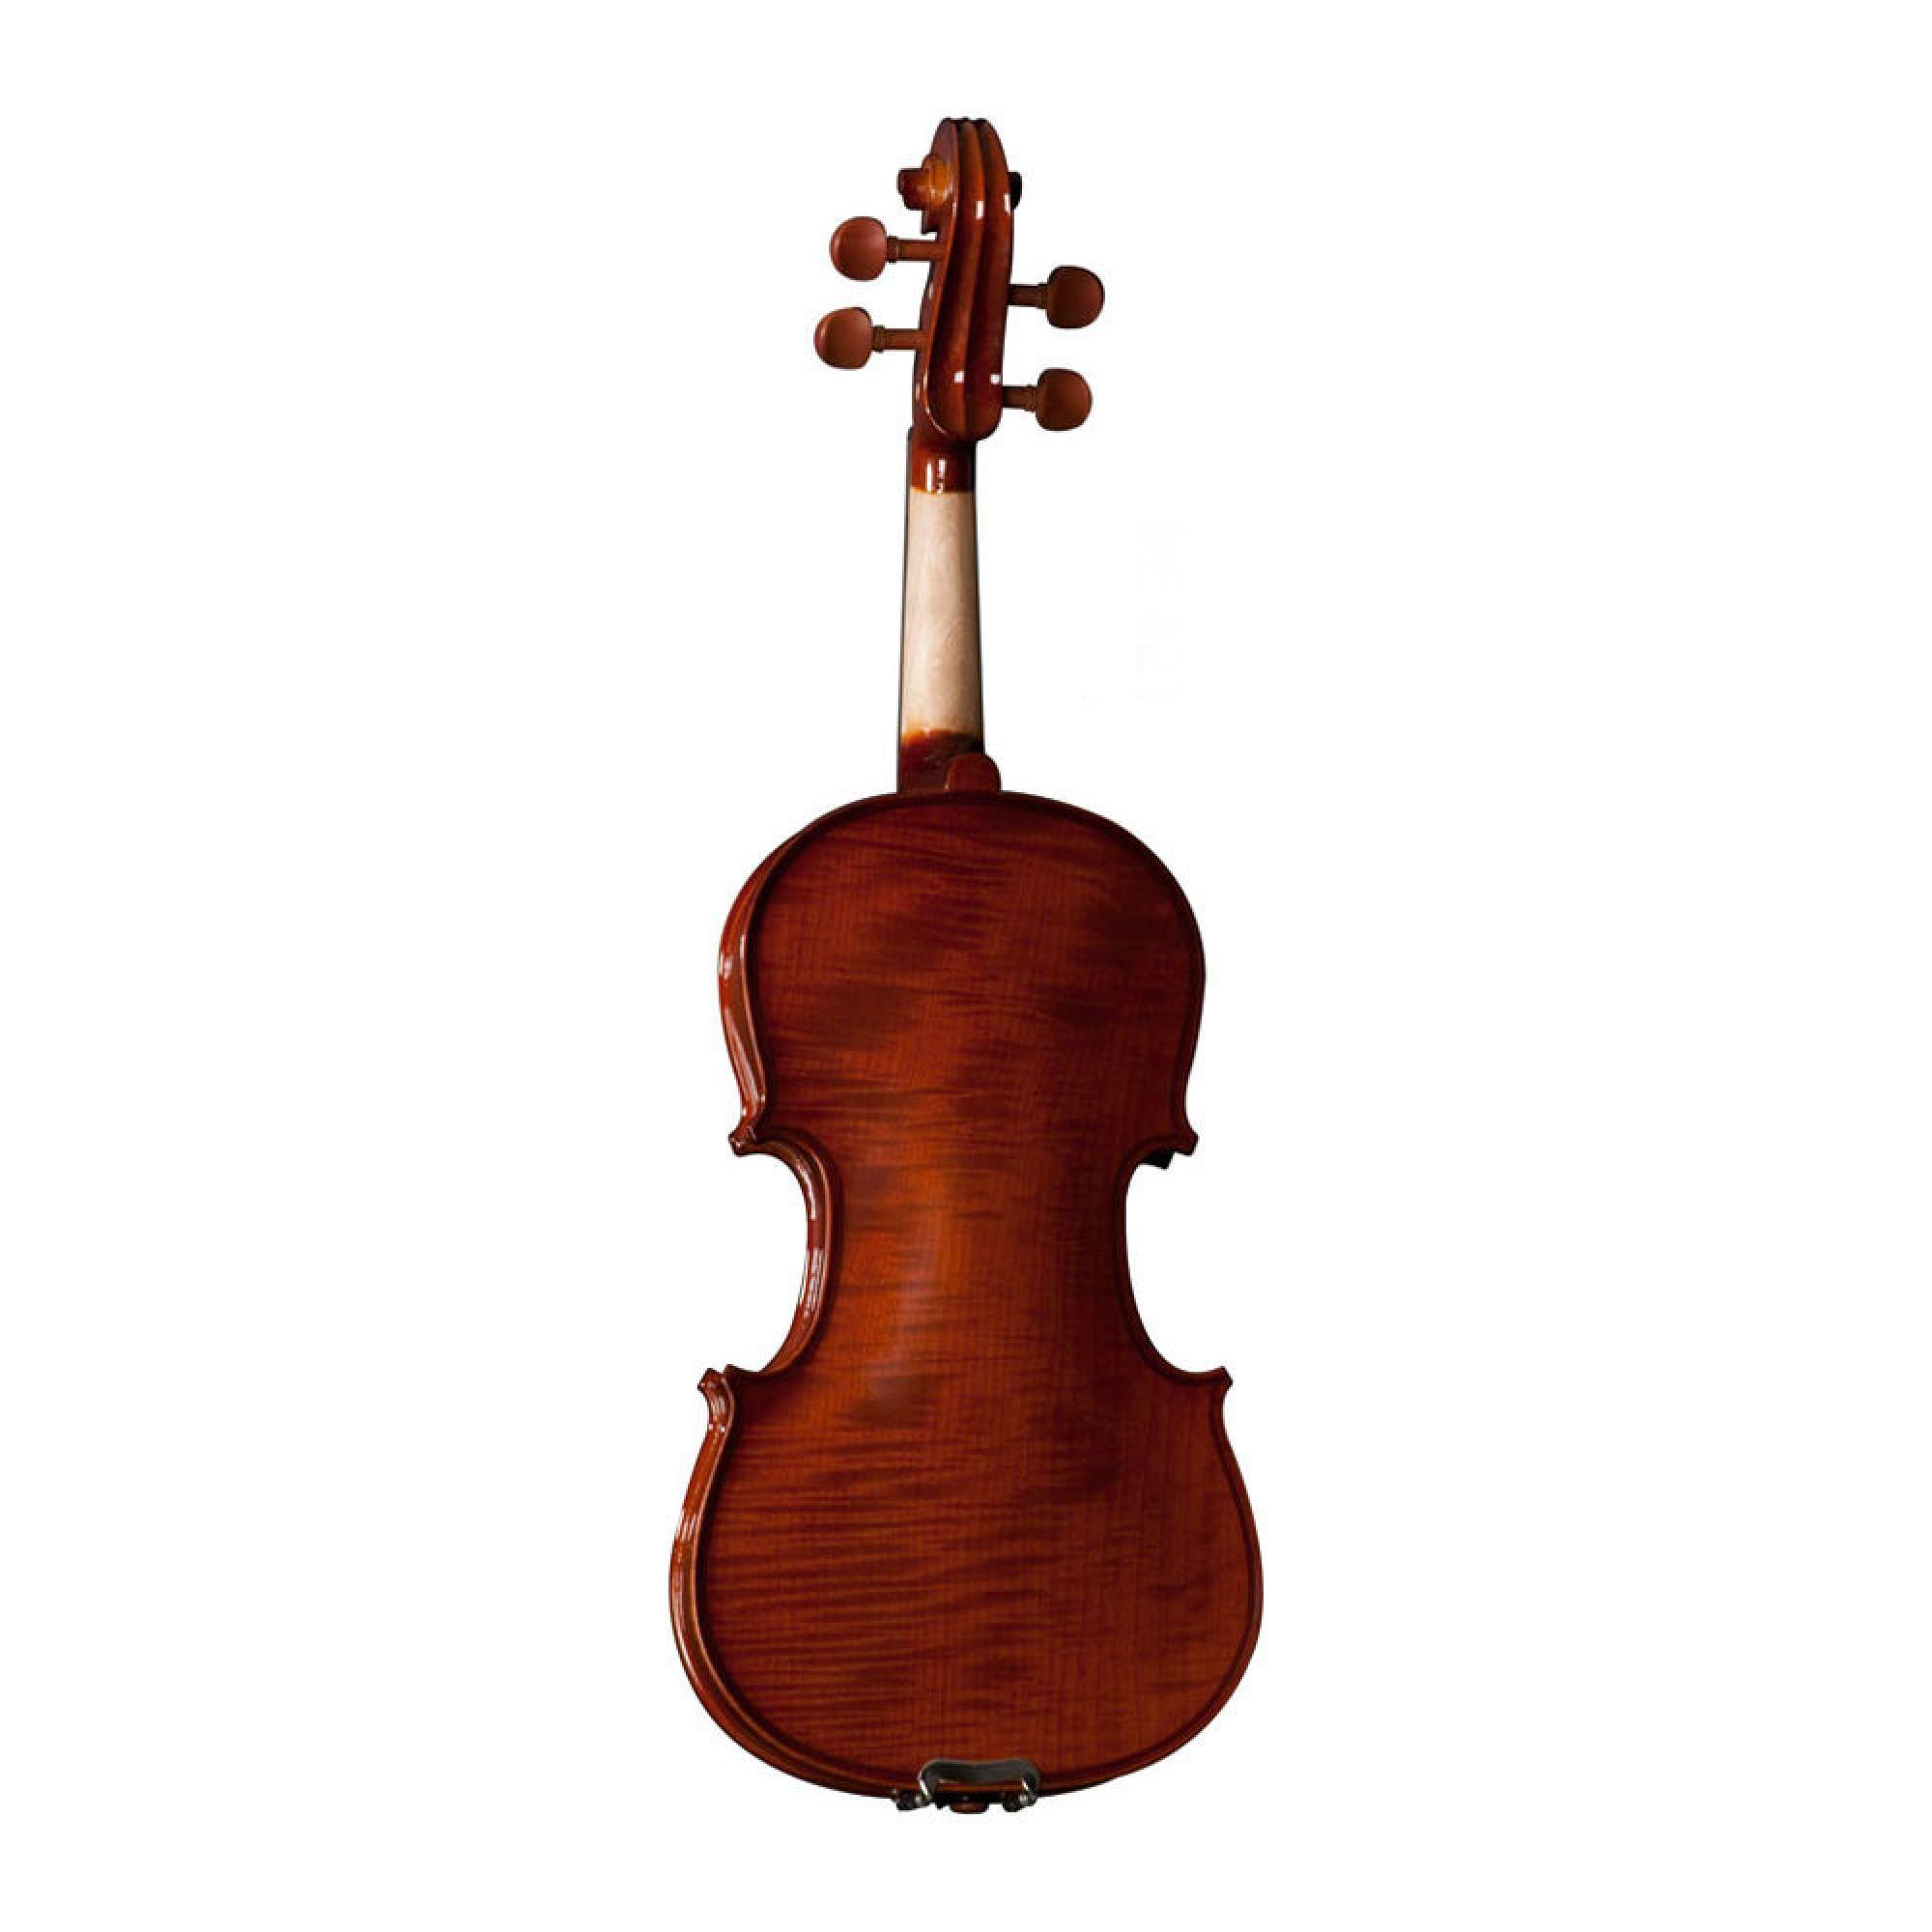 Violino EAGLE 1/2 Classic Series VE421 Envernizado